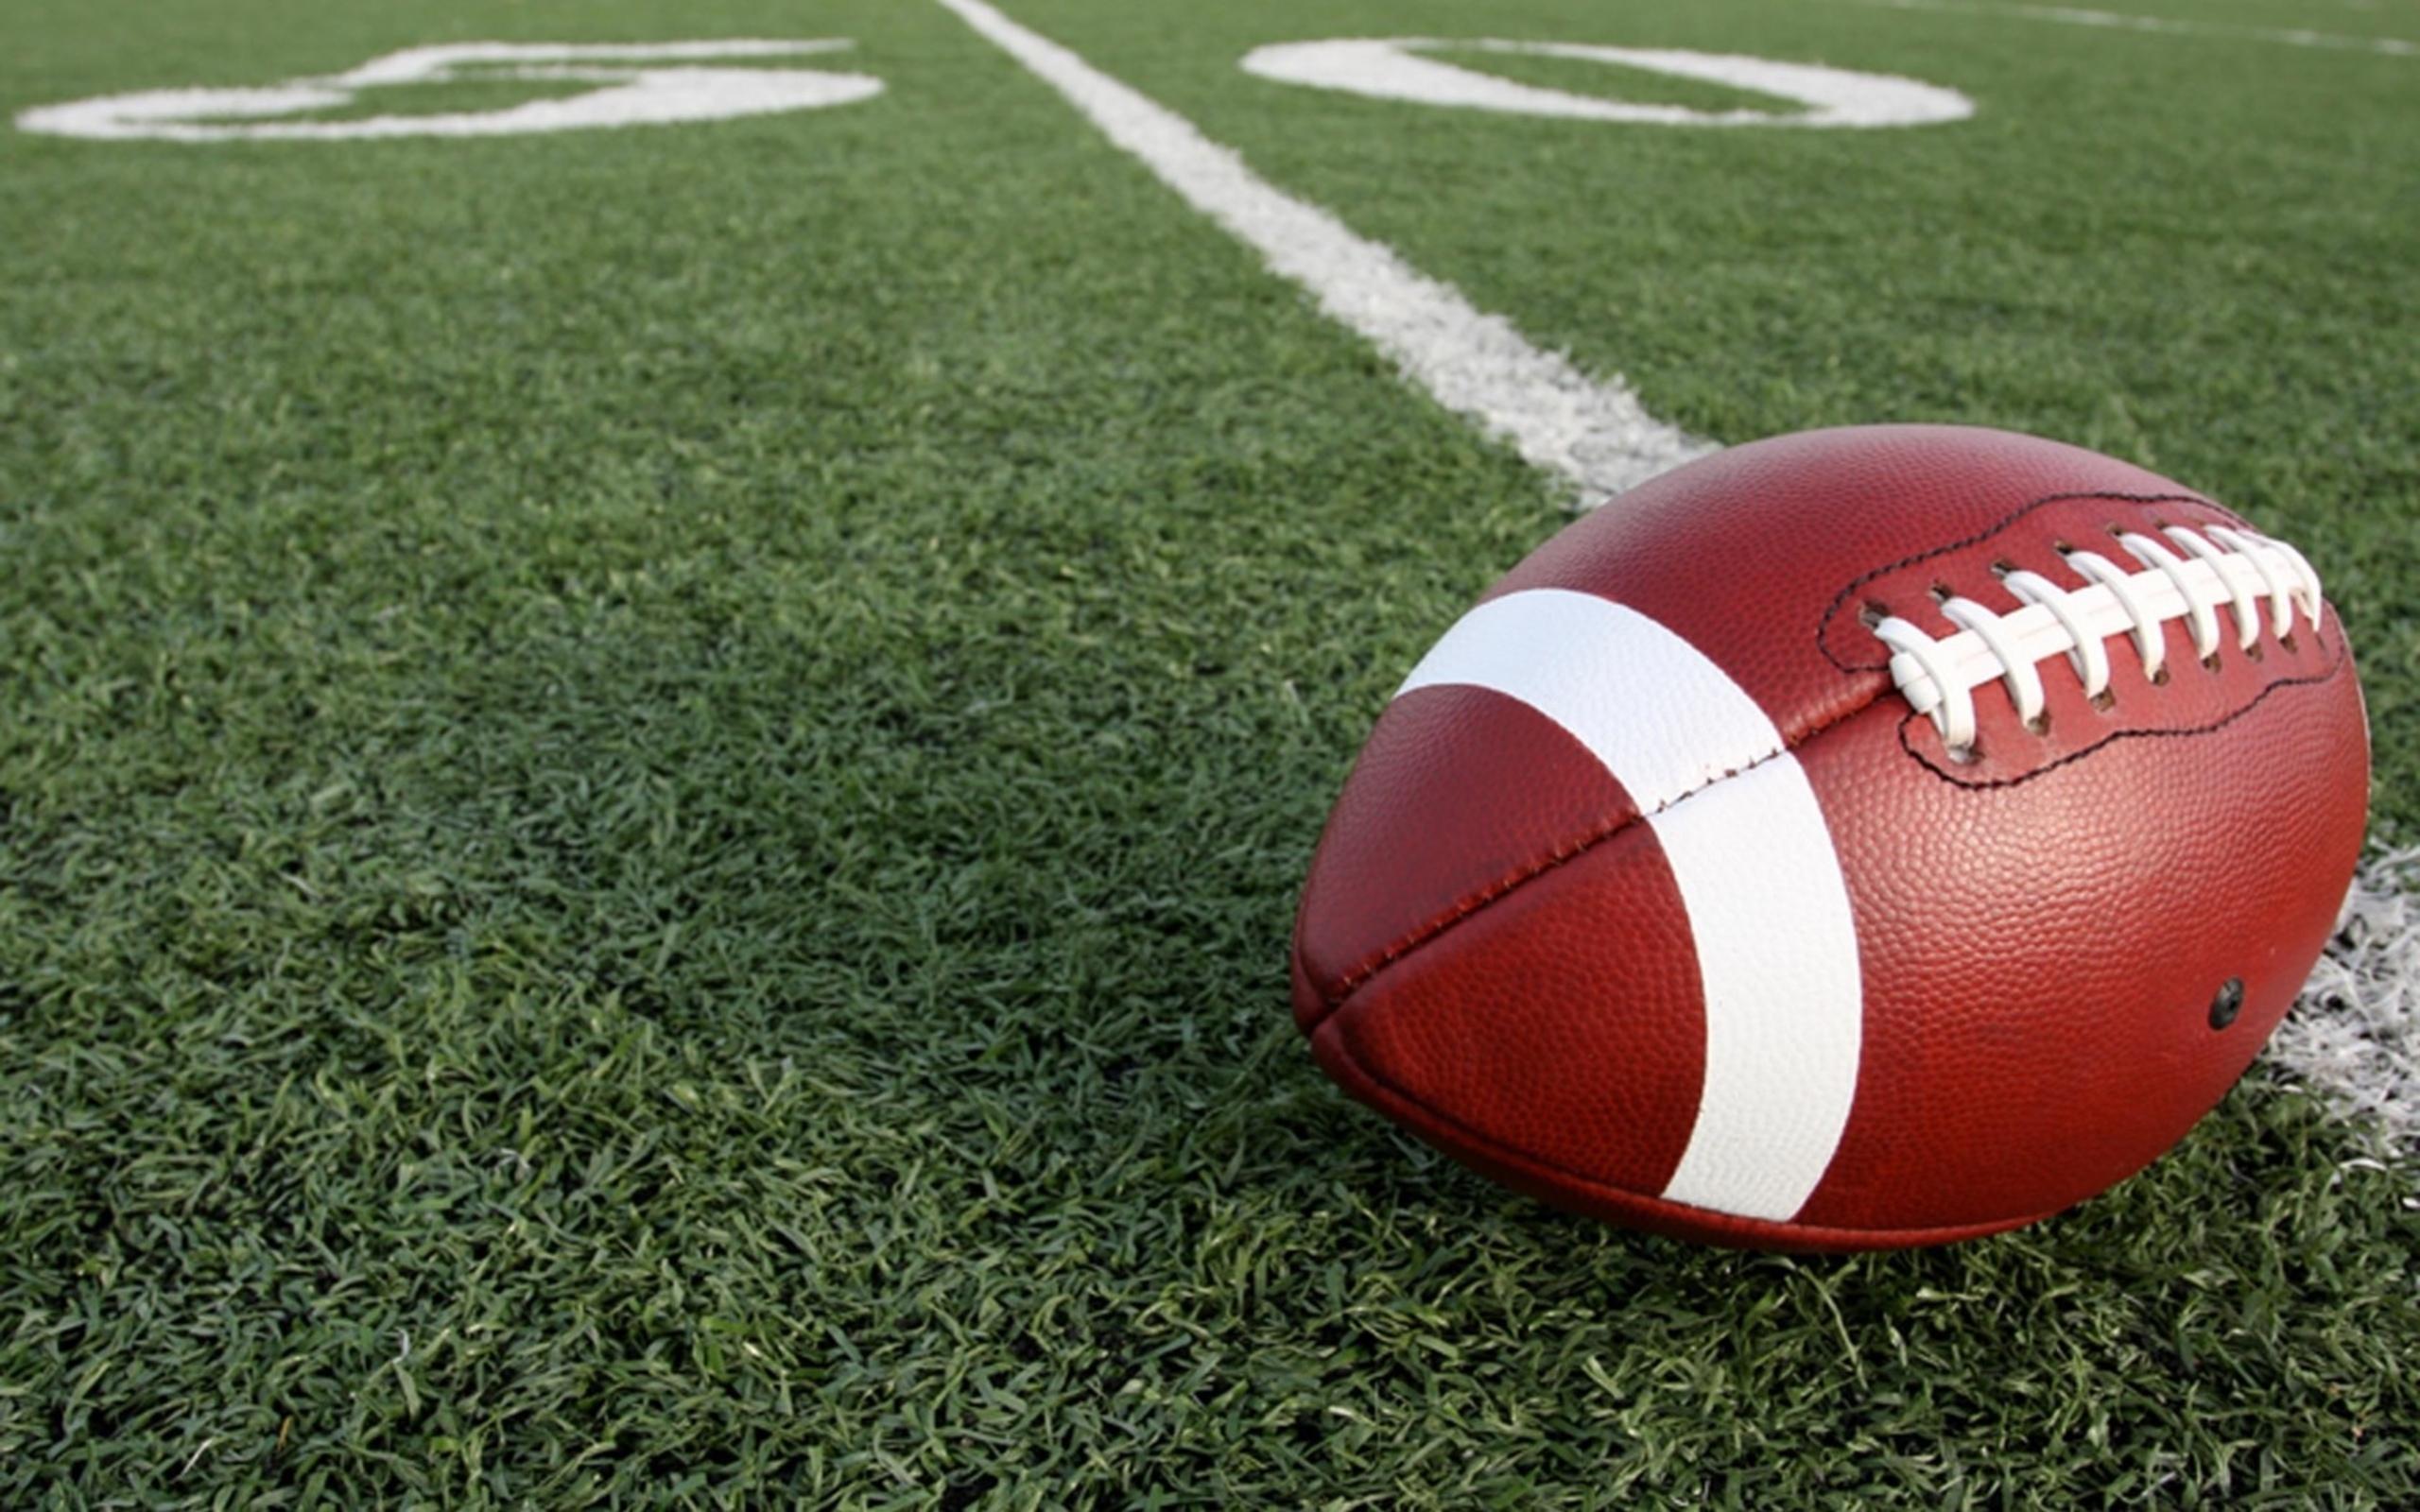 Football Wallpaper · Football Wallpaper · Football Wallpaper ...